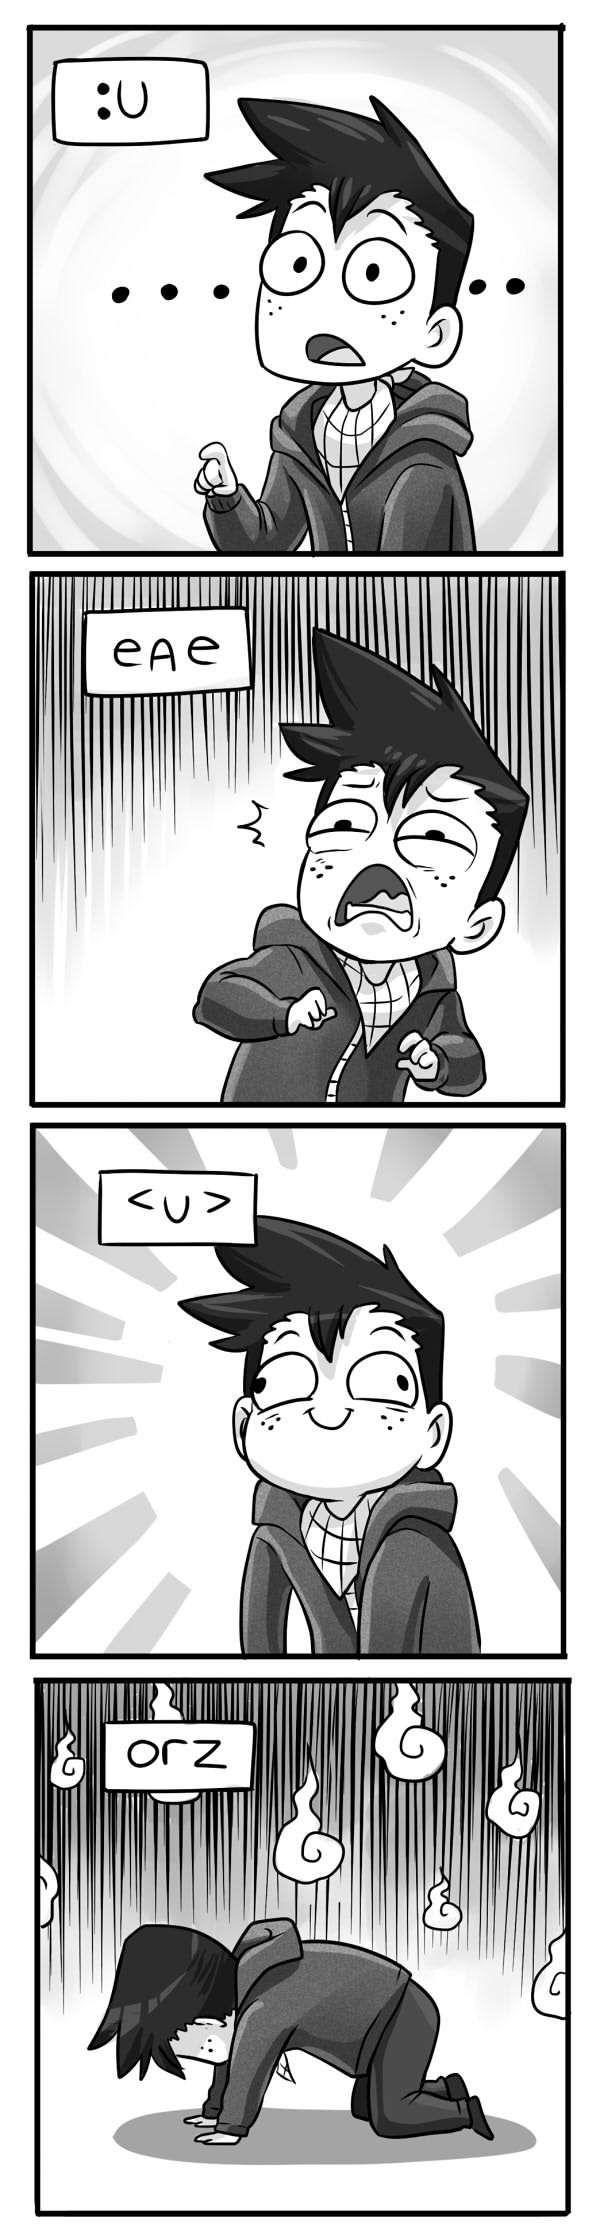 Mondo Mango :: What I Mean | Tapastic Comics - image 1